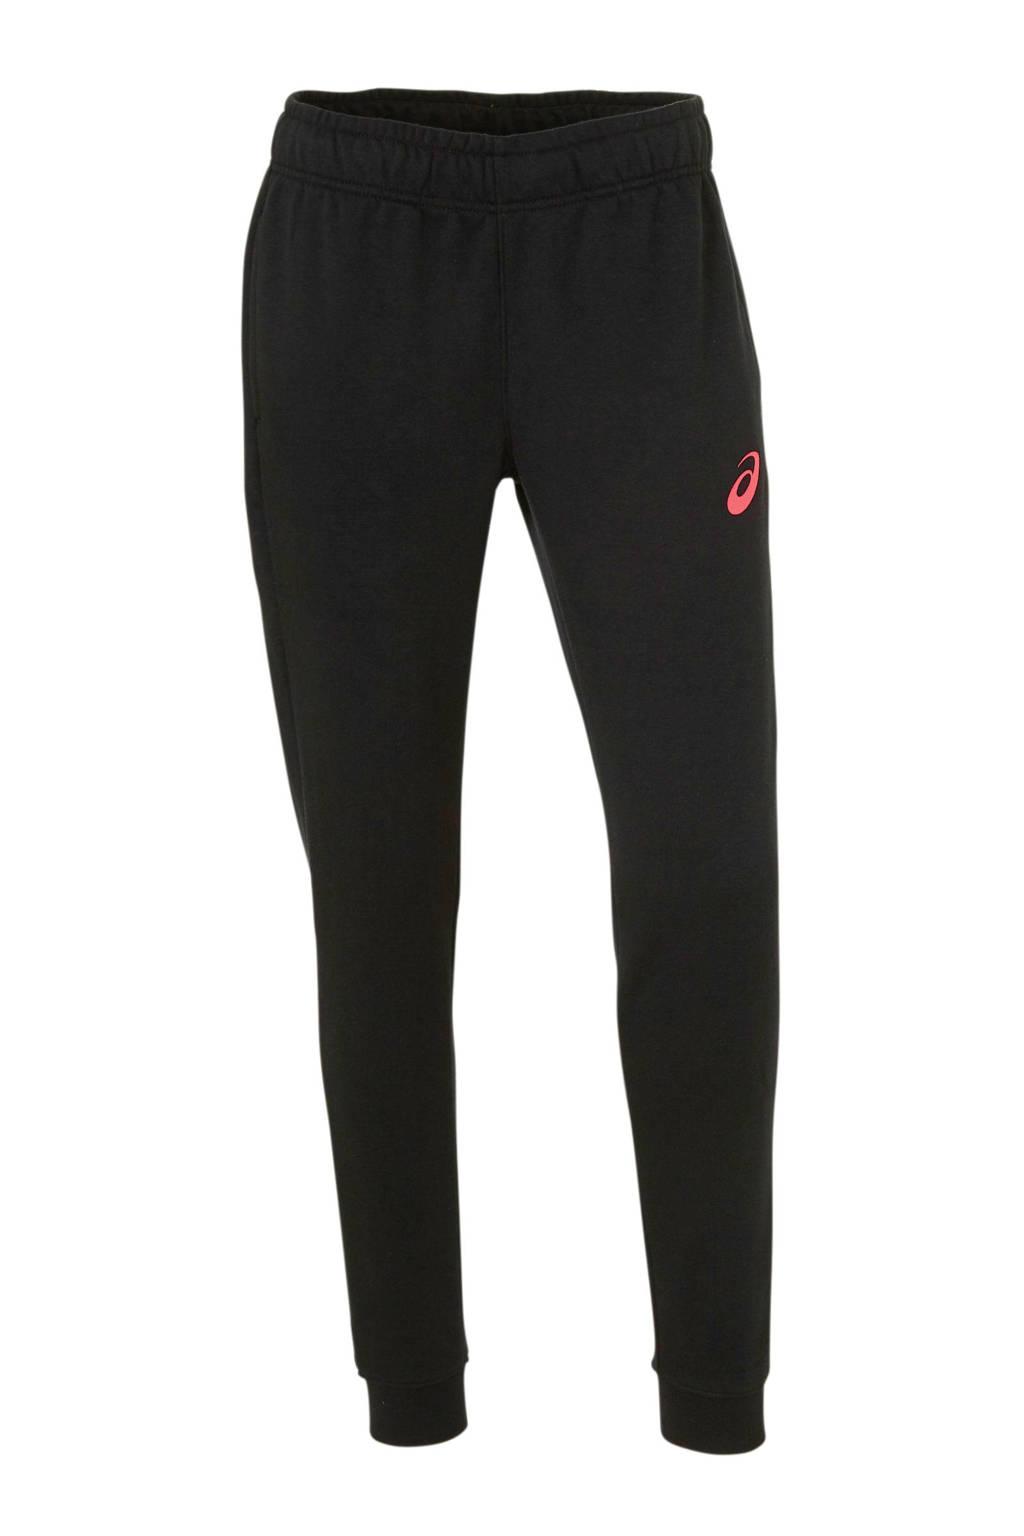 ASICS joggingbroek zwart/roze, Zwart